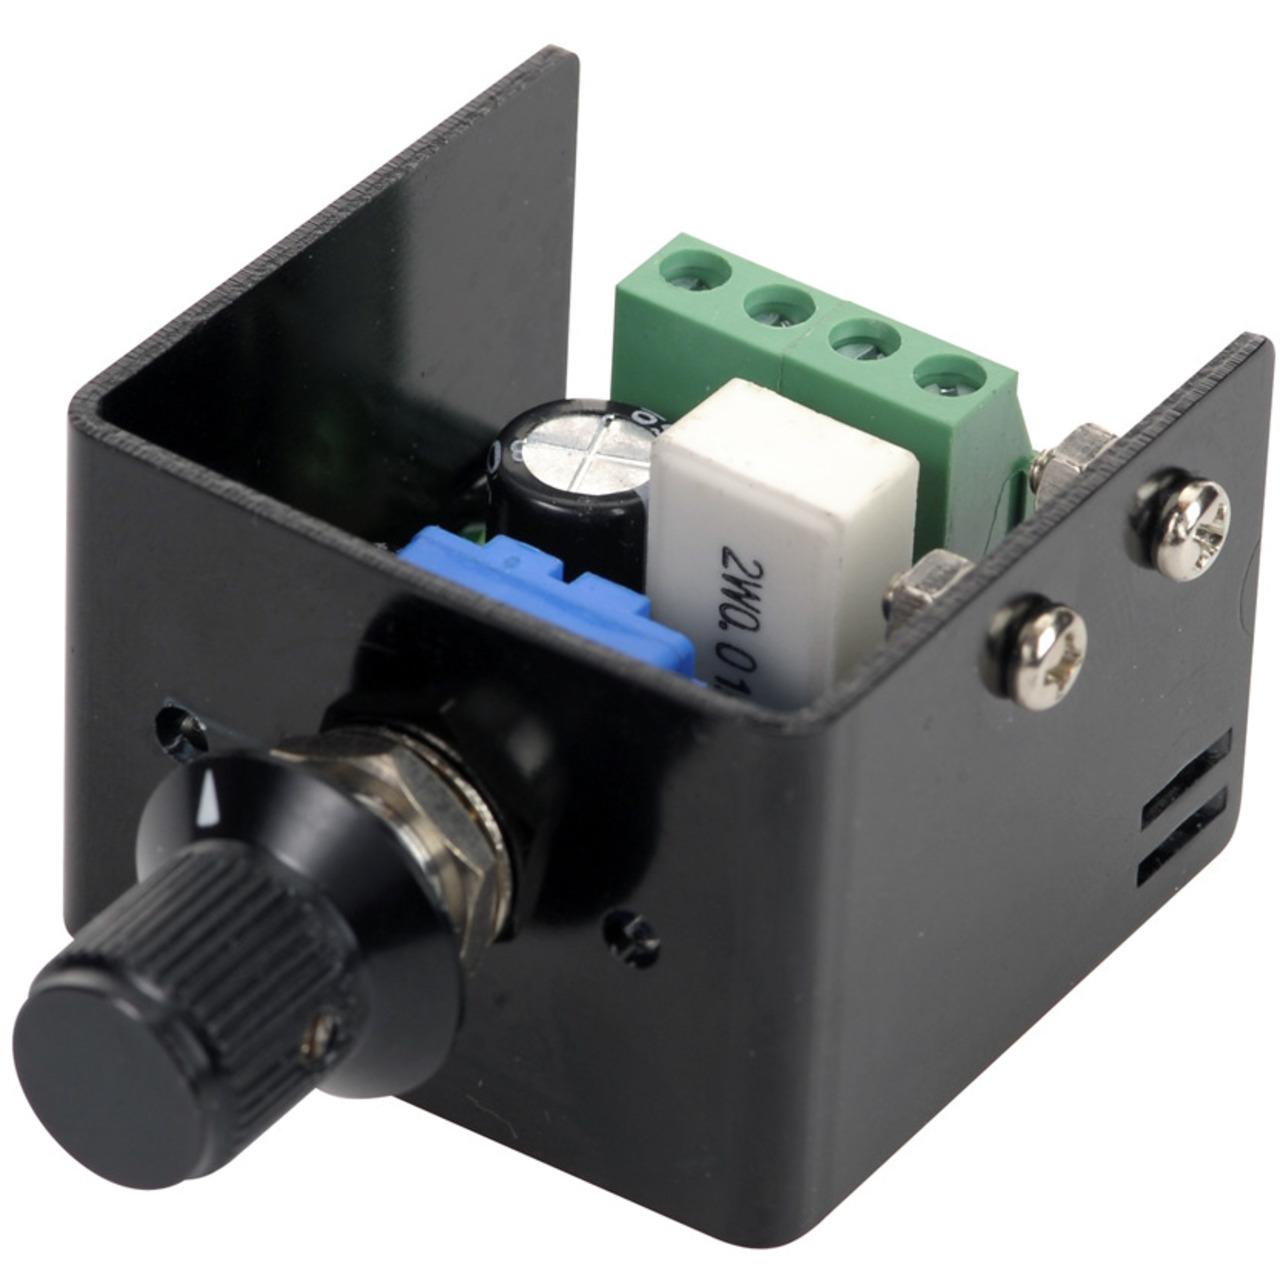 H-Tronic Drehzahlsteller 12-24V 5A